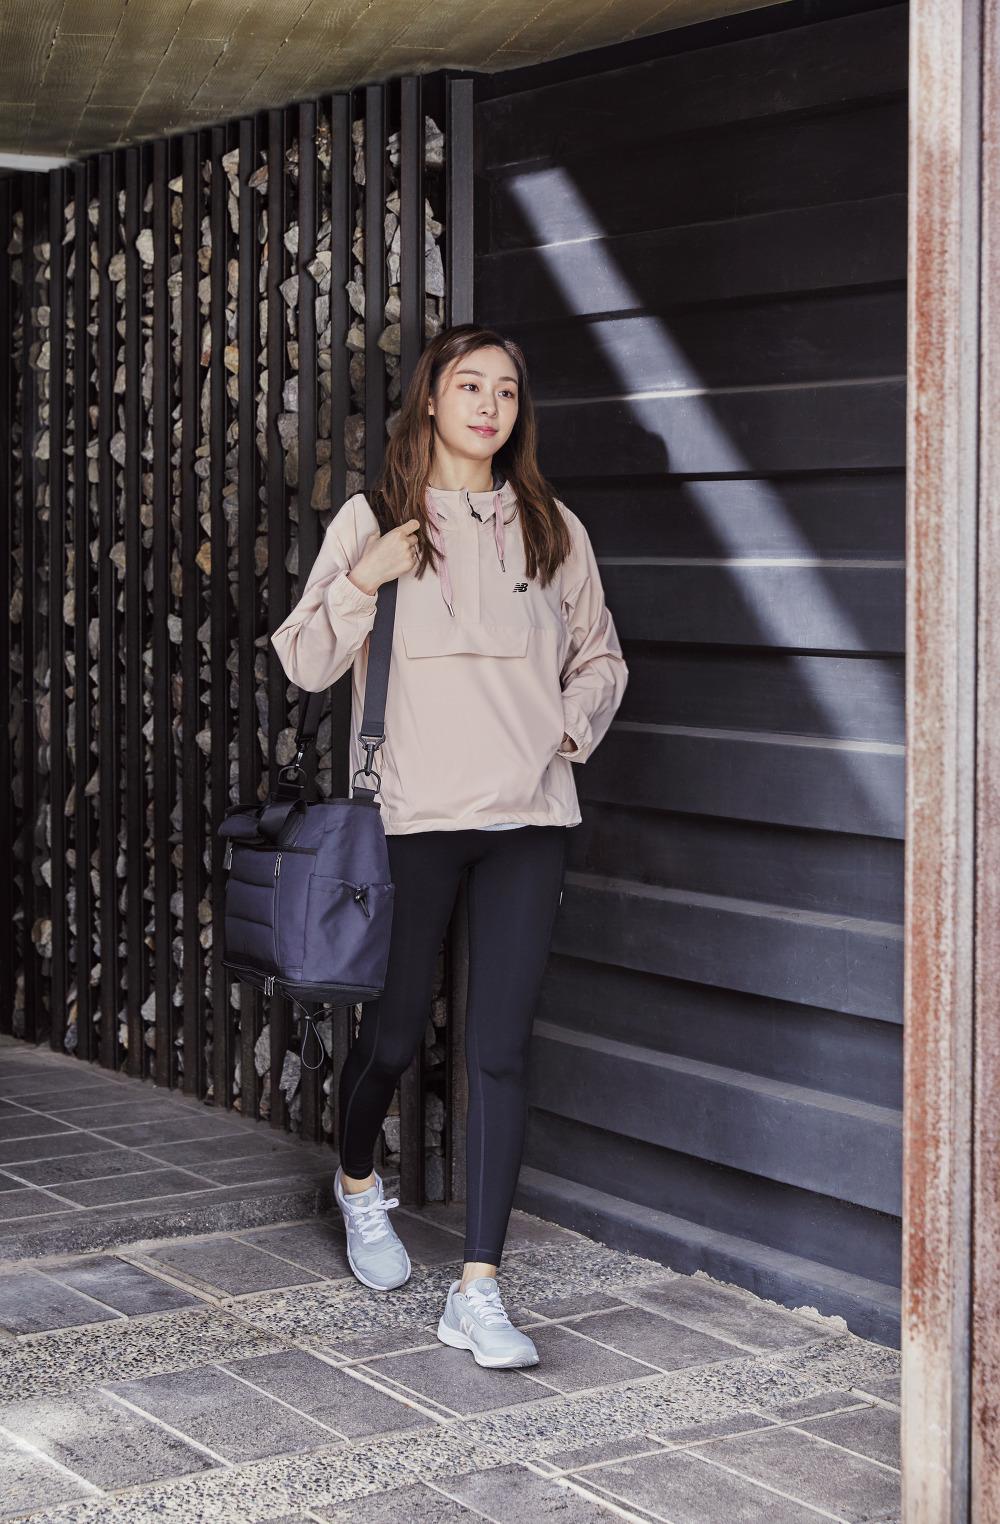 newBalance 2018ss Yuna Kim_17_WOMEN 하이웨스트 NB 레깅스